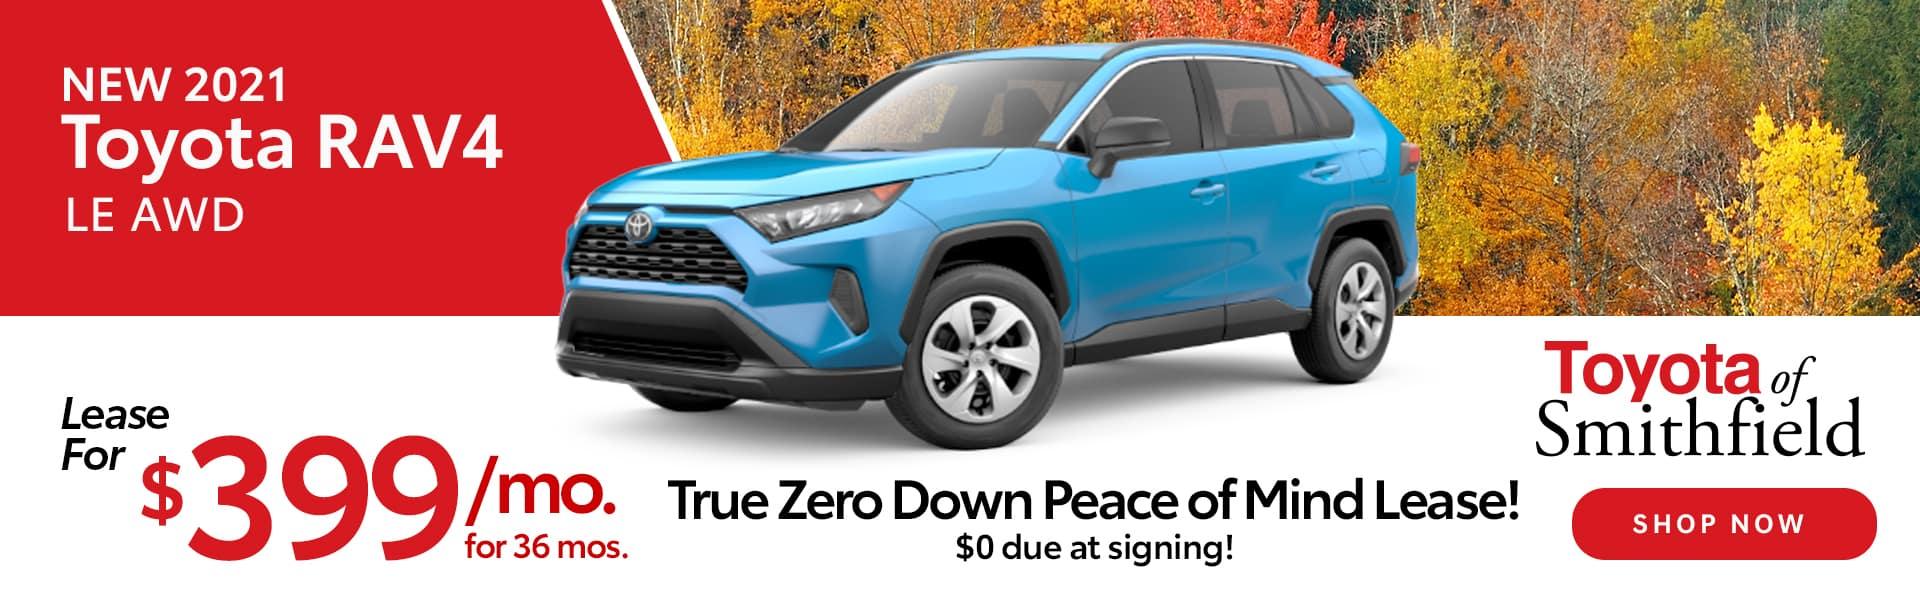 TOS_1920x614_New 2021 Toyota RAV4 LE AWD_0921